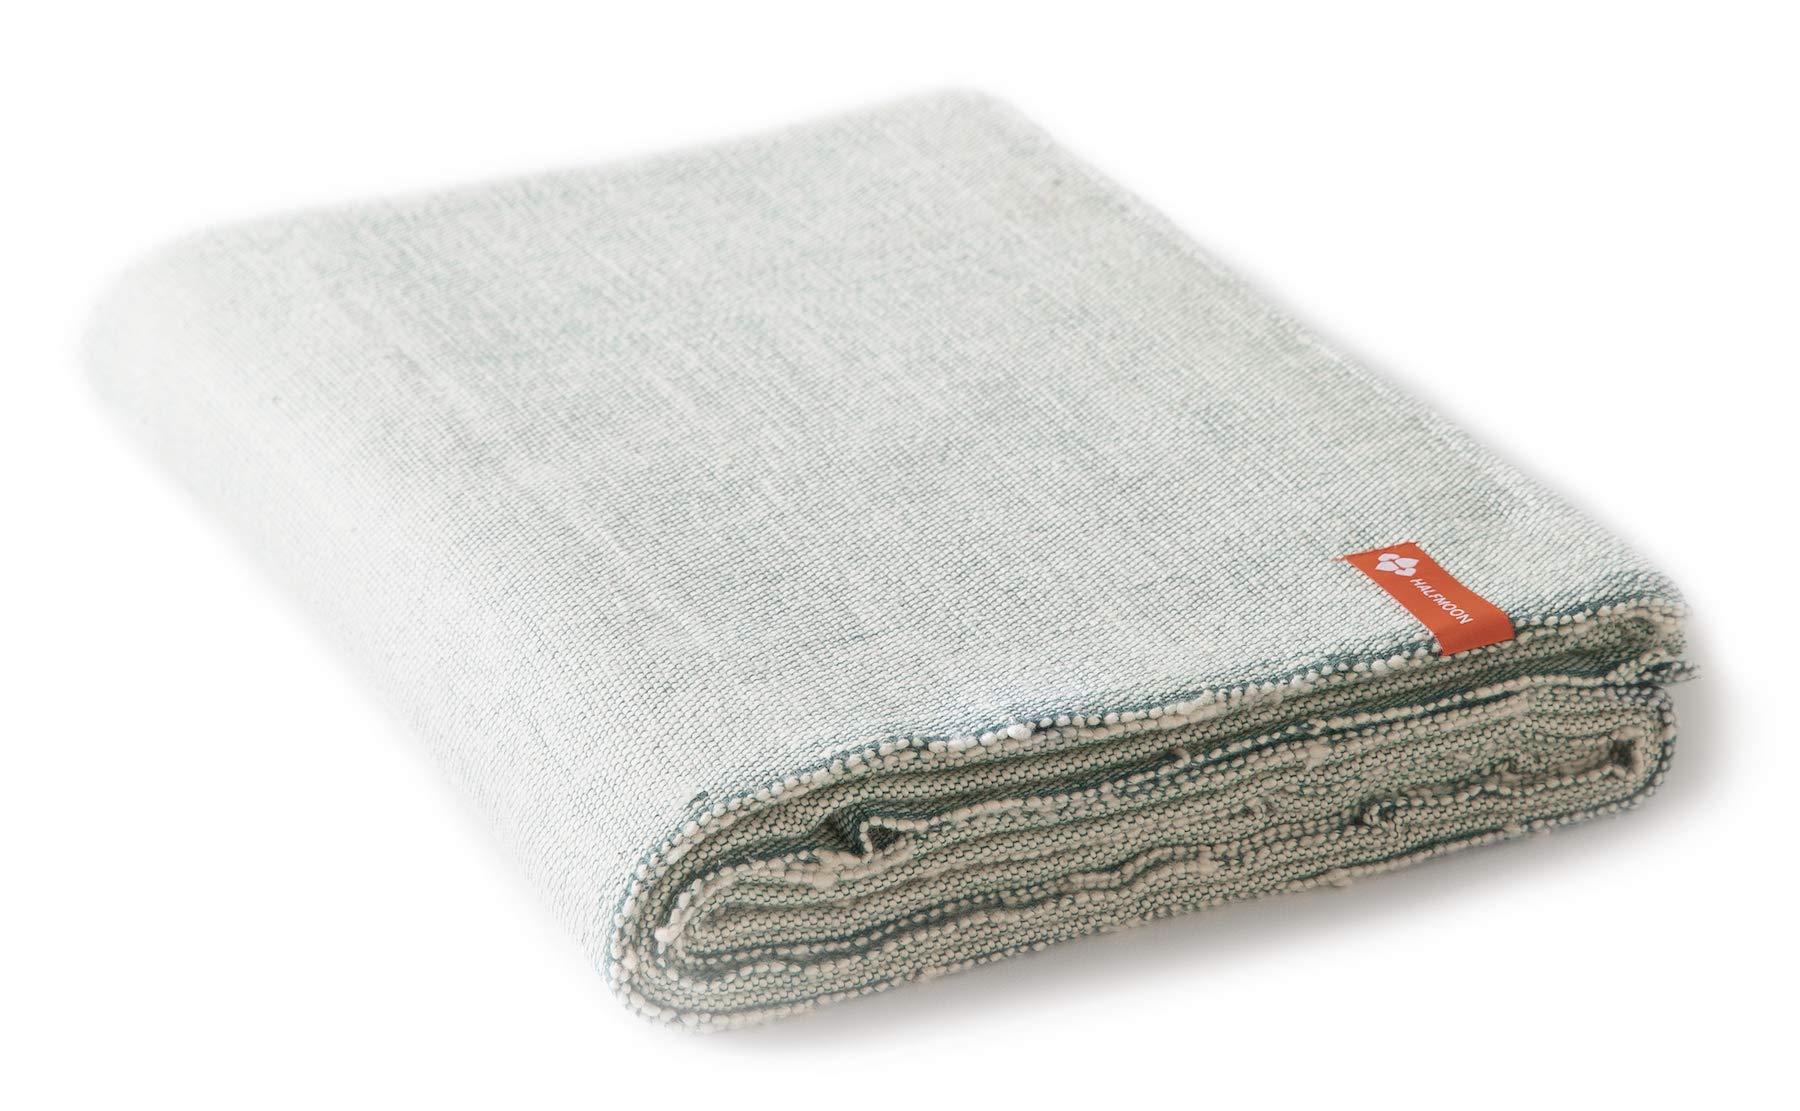 Halfmoon Cotton Yoga Blanket - Alpine Weave